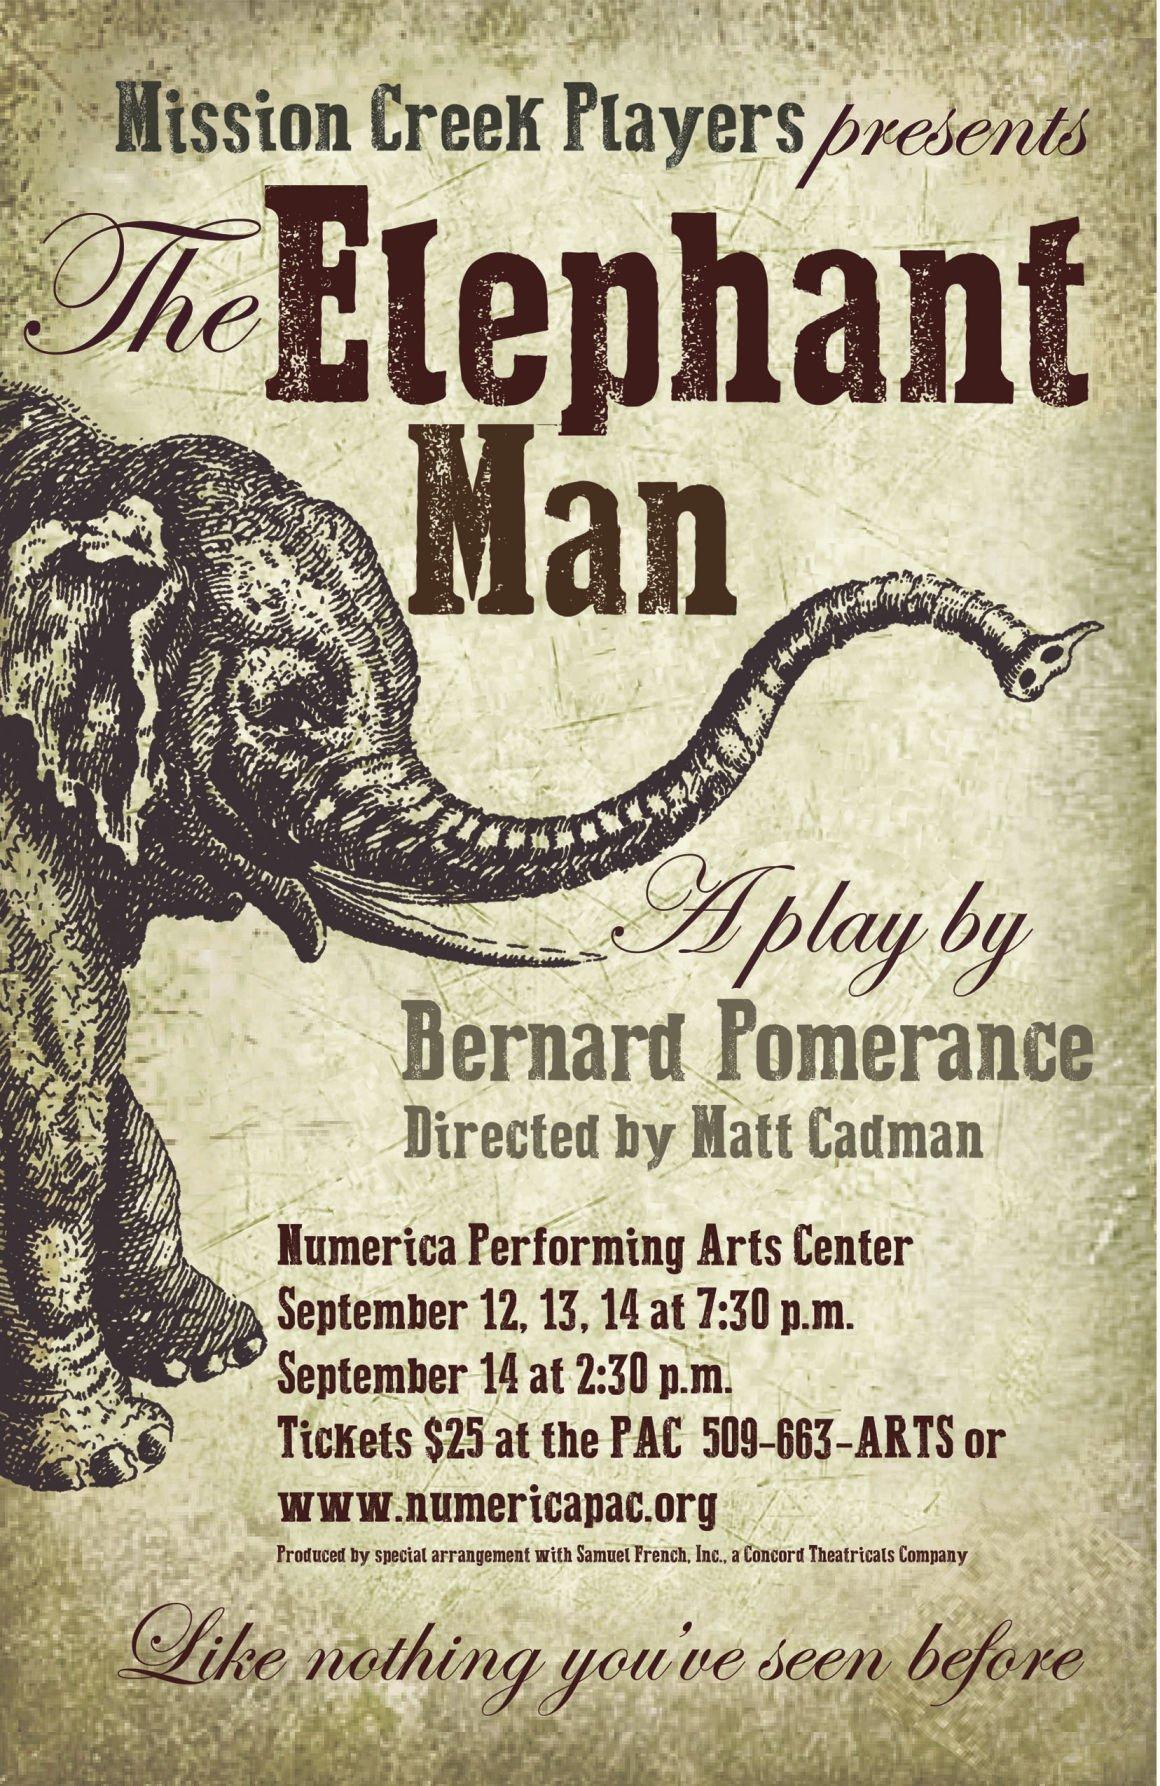 Elephant poster proof 2.jpg